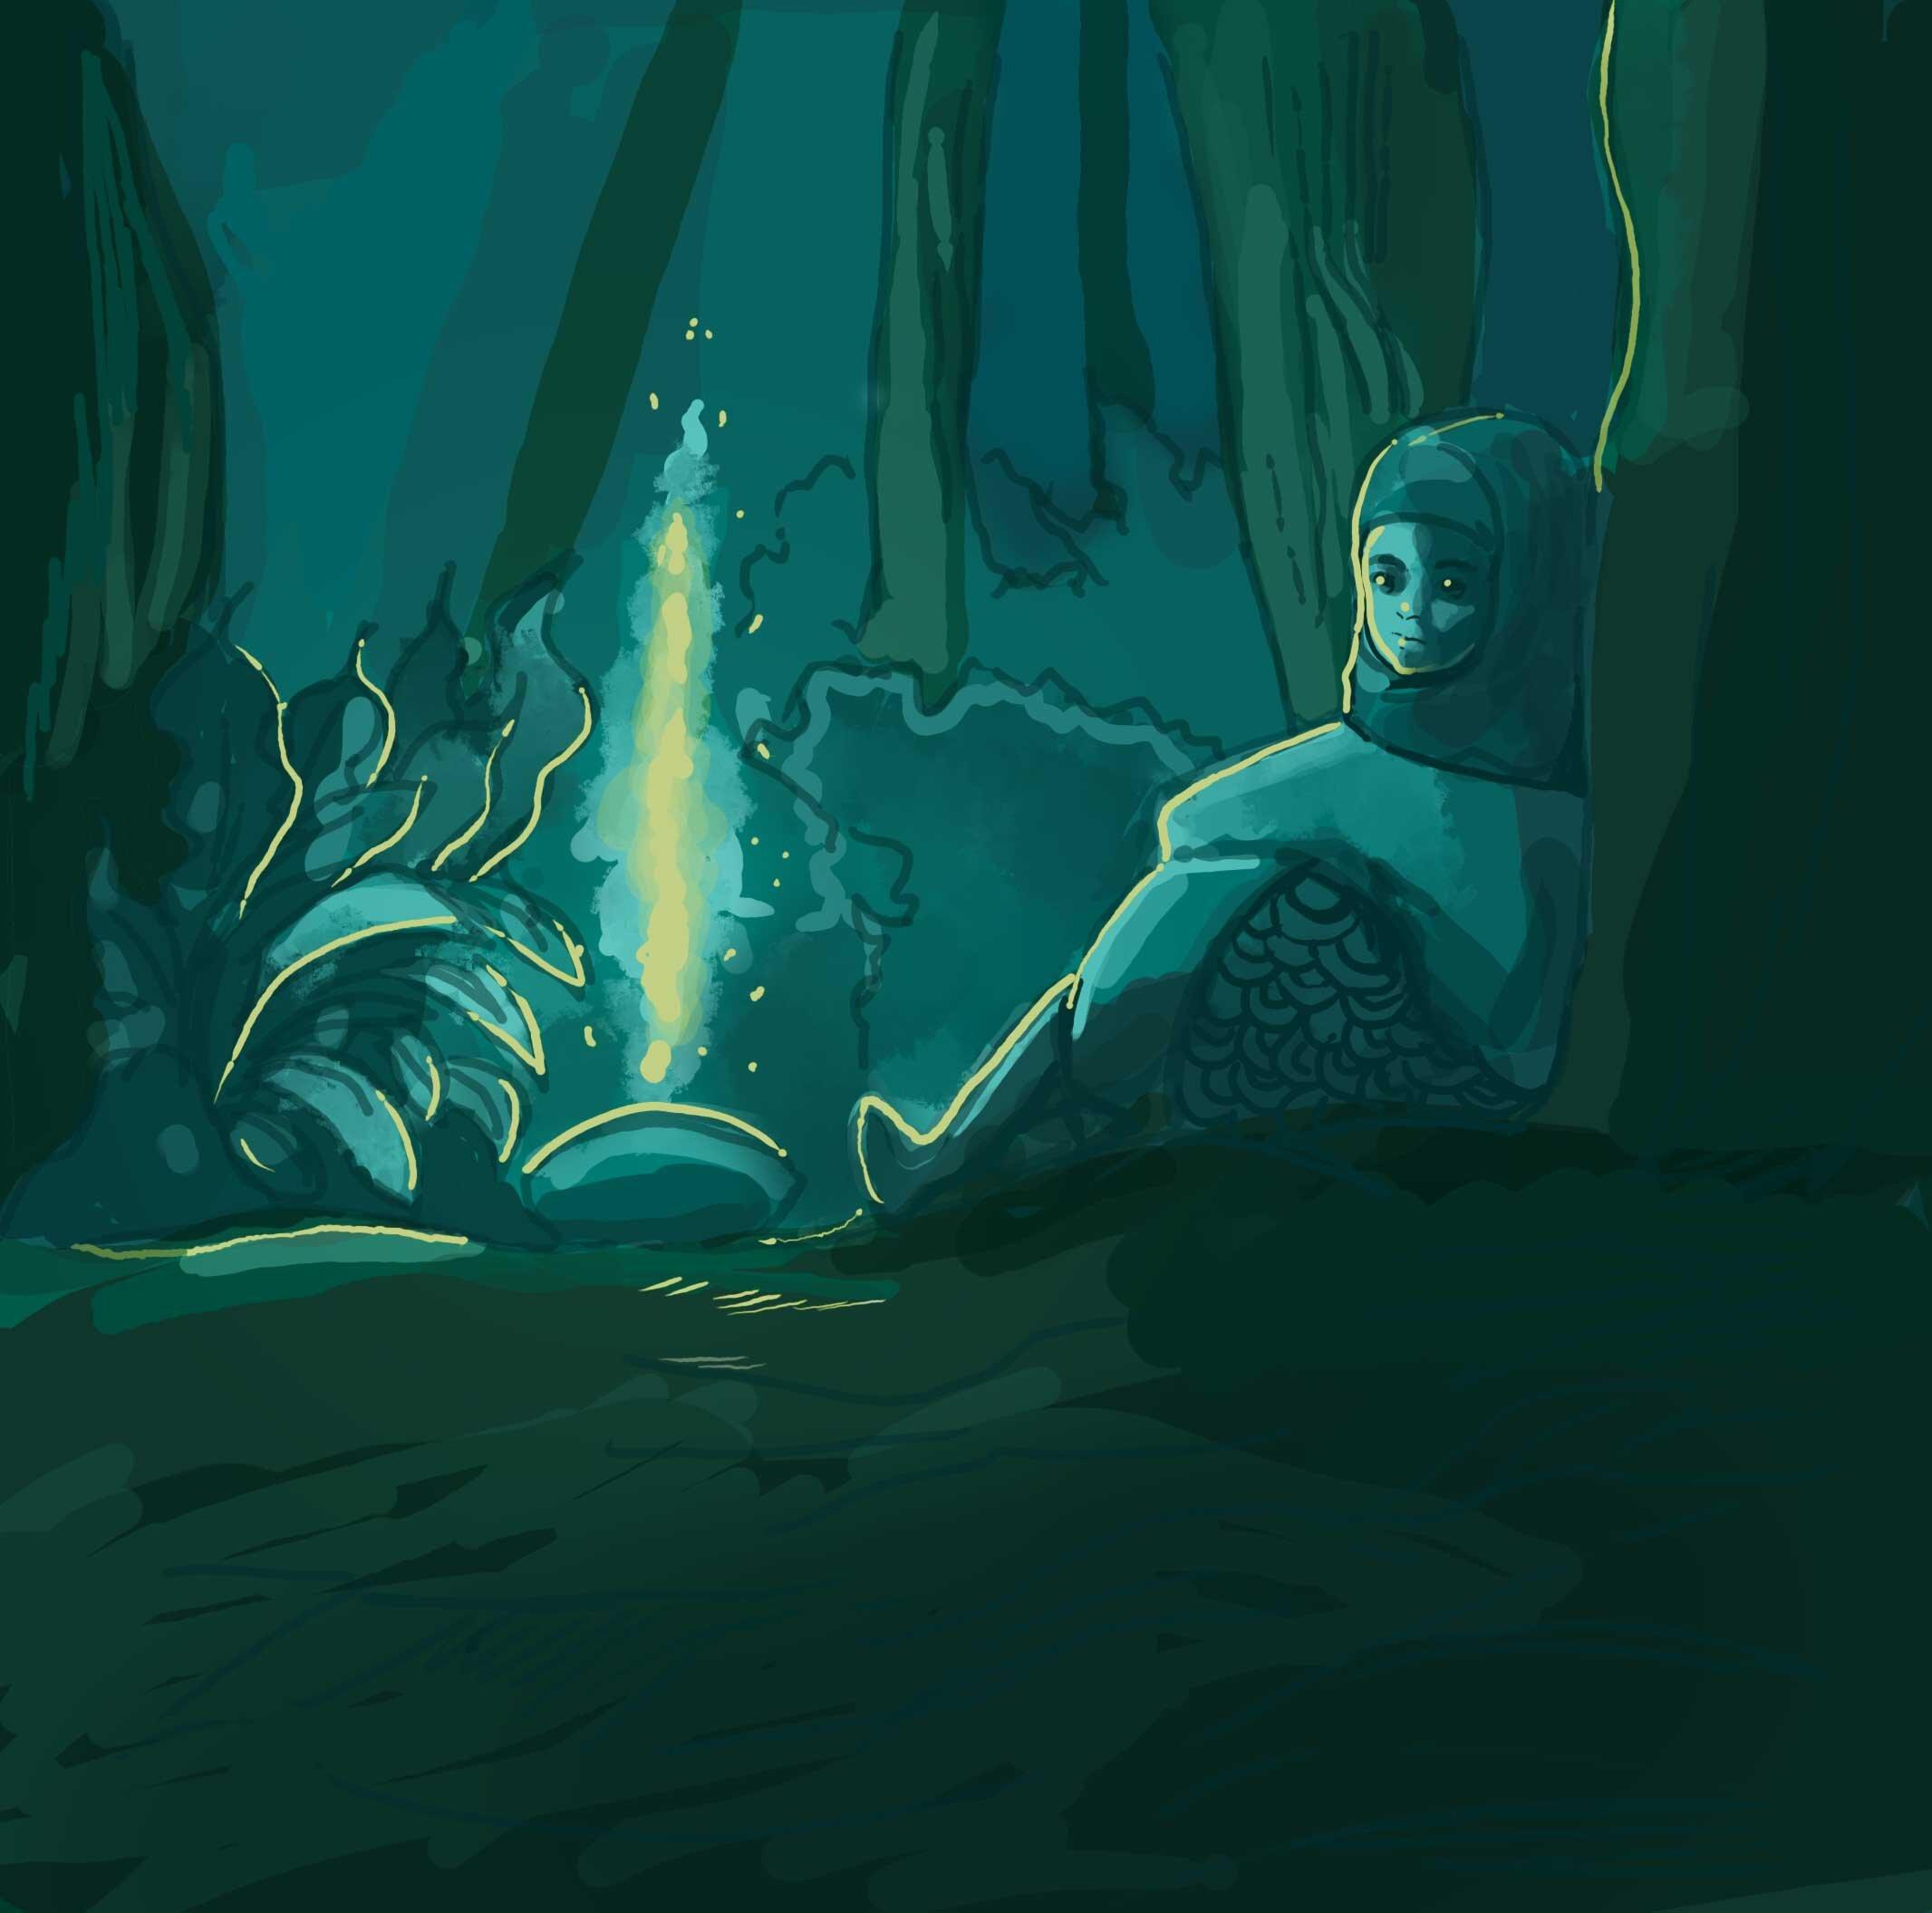 Girl sitting near fire in a very dark forest